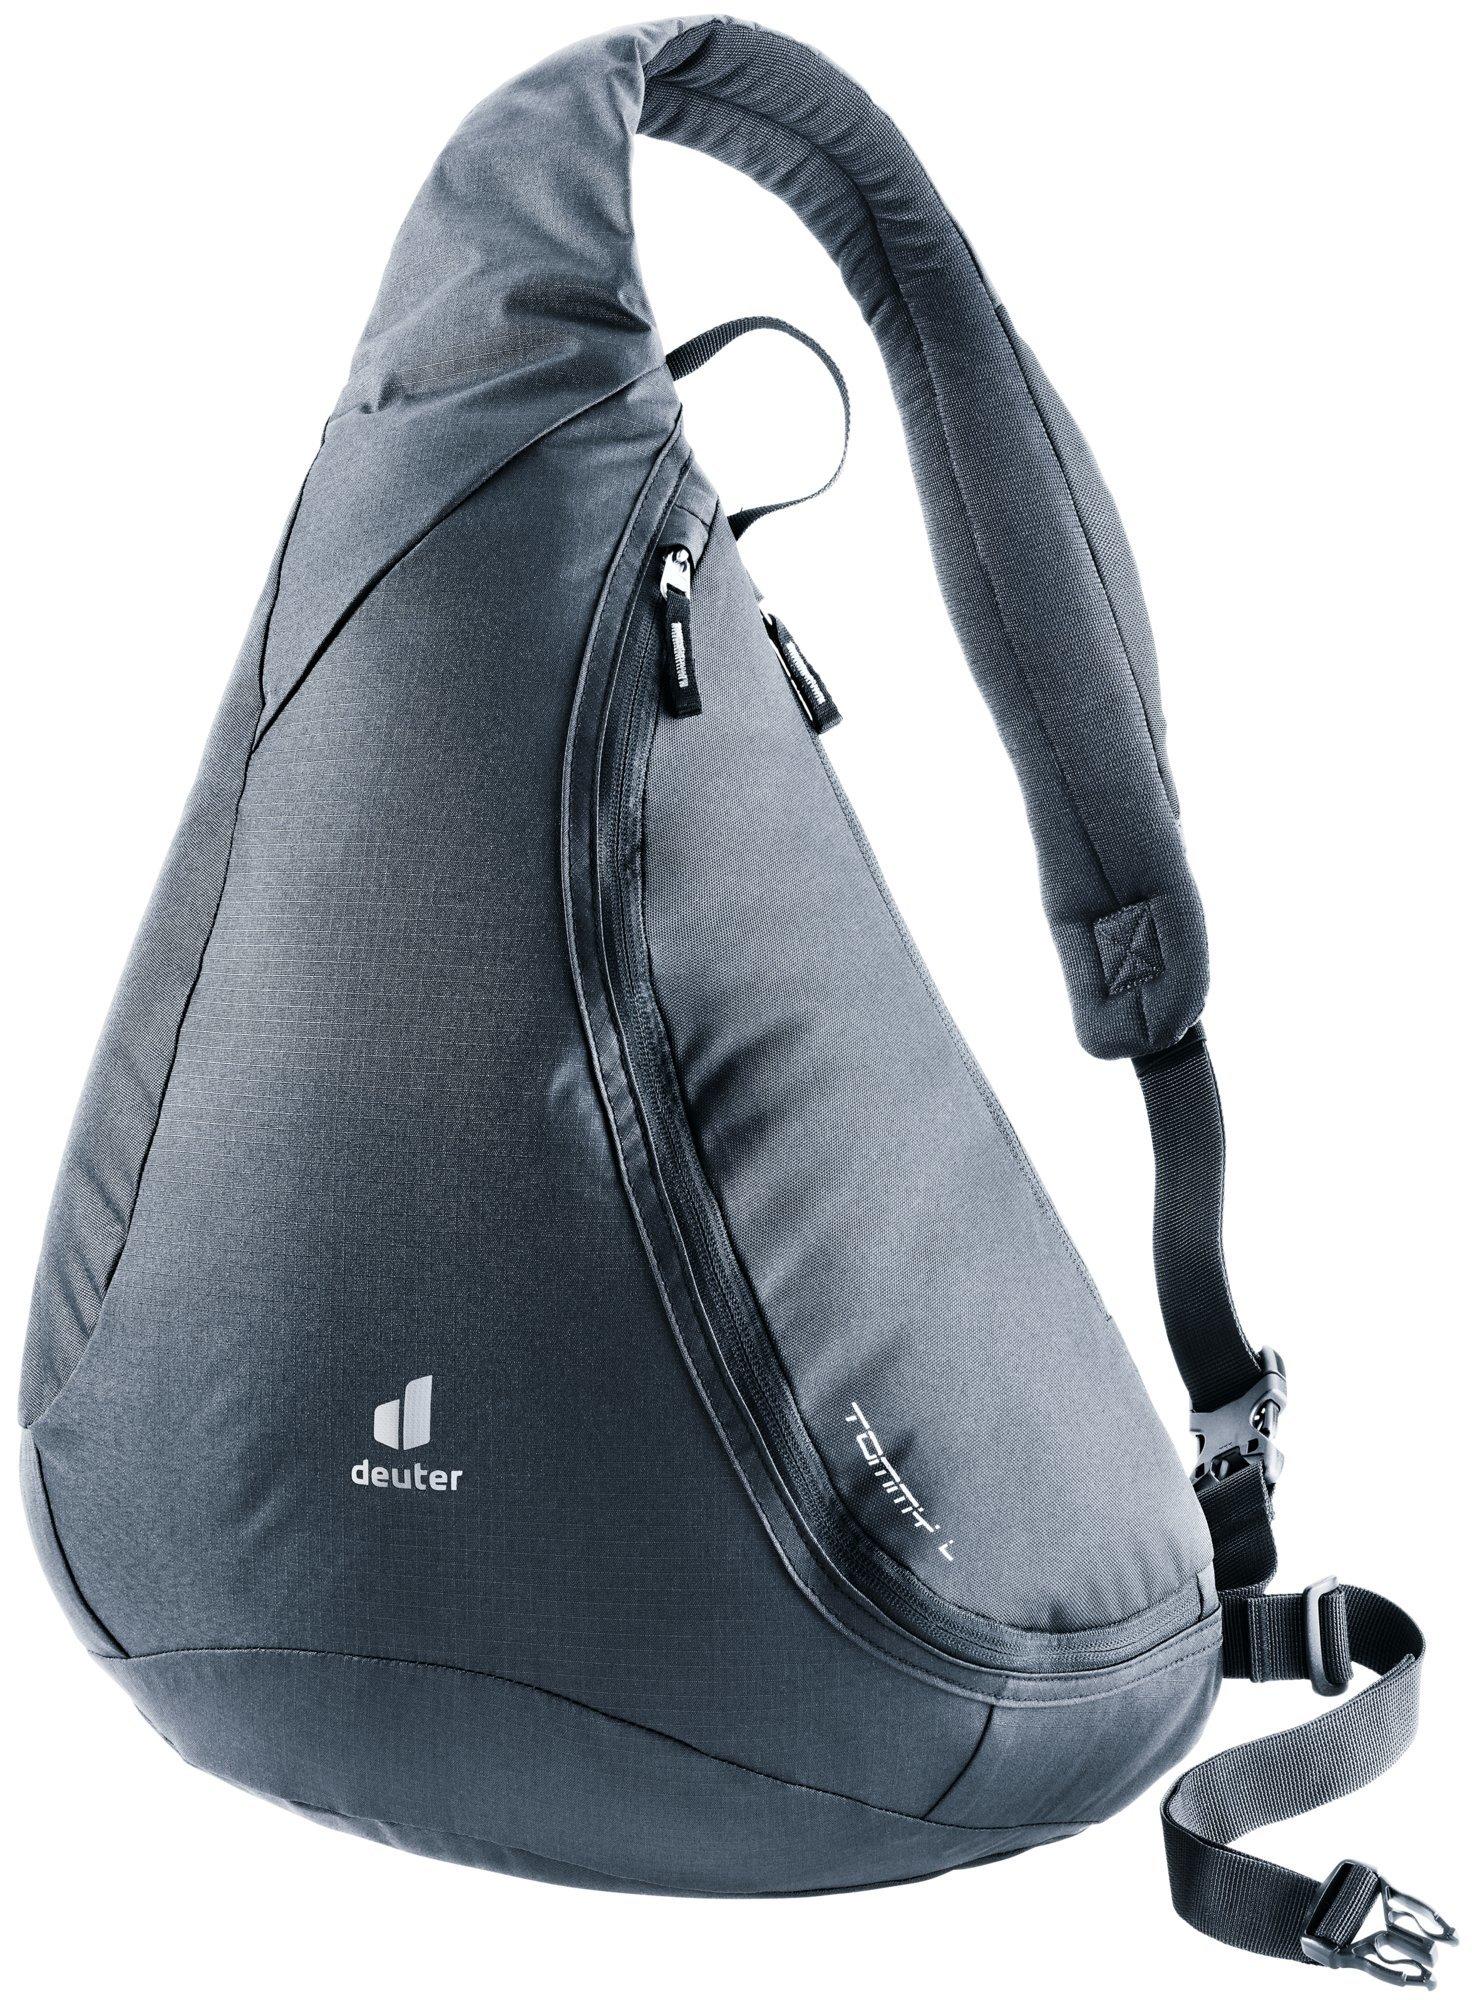 Однолямочные рюкзаки Рюкзак однолямочный Deuter Tommy L (2021) 3800221-7000-TommyL-s19-d0.jpg